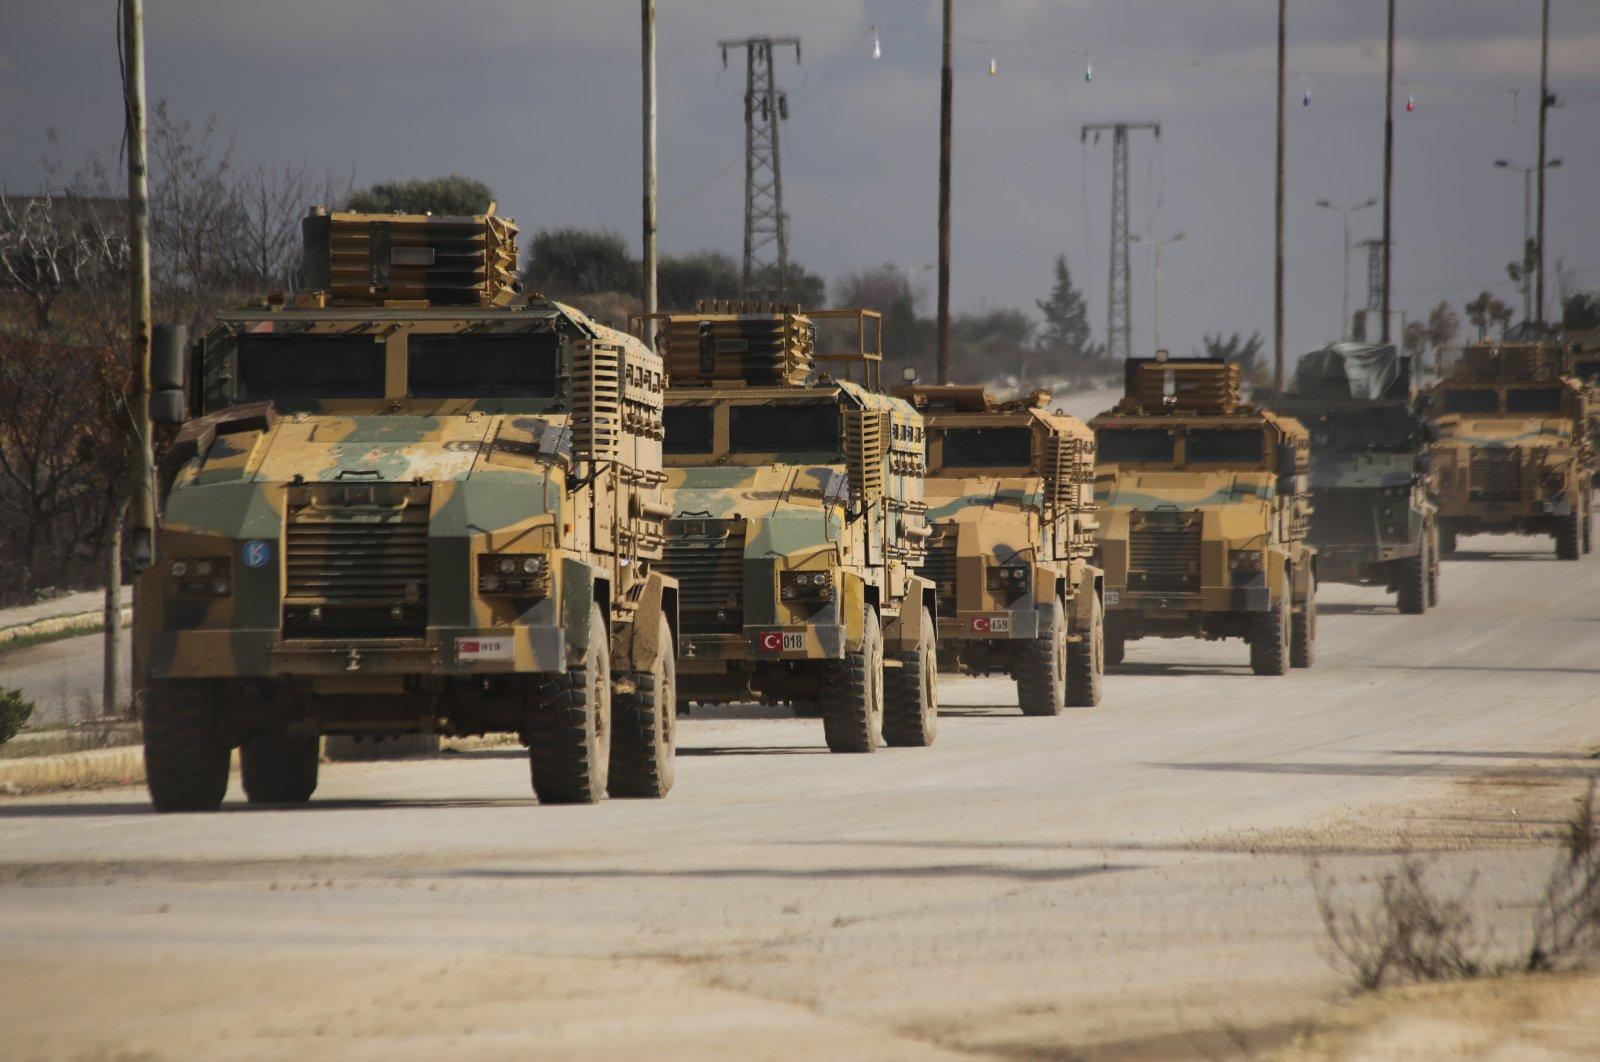 Turkish military convoy drives in Idlib province, Syria, Saturday, Feb. 22, 2020. (AP Photo)